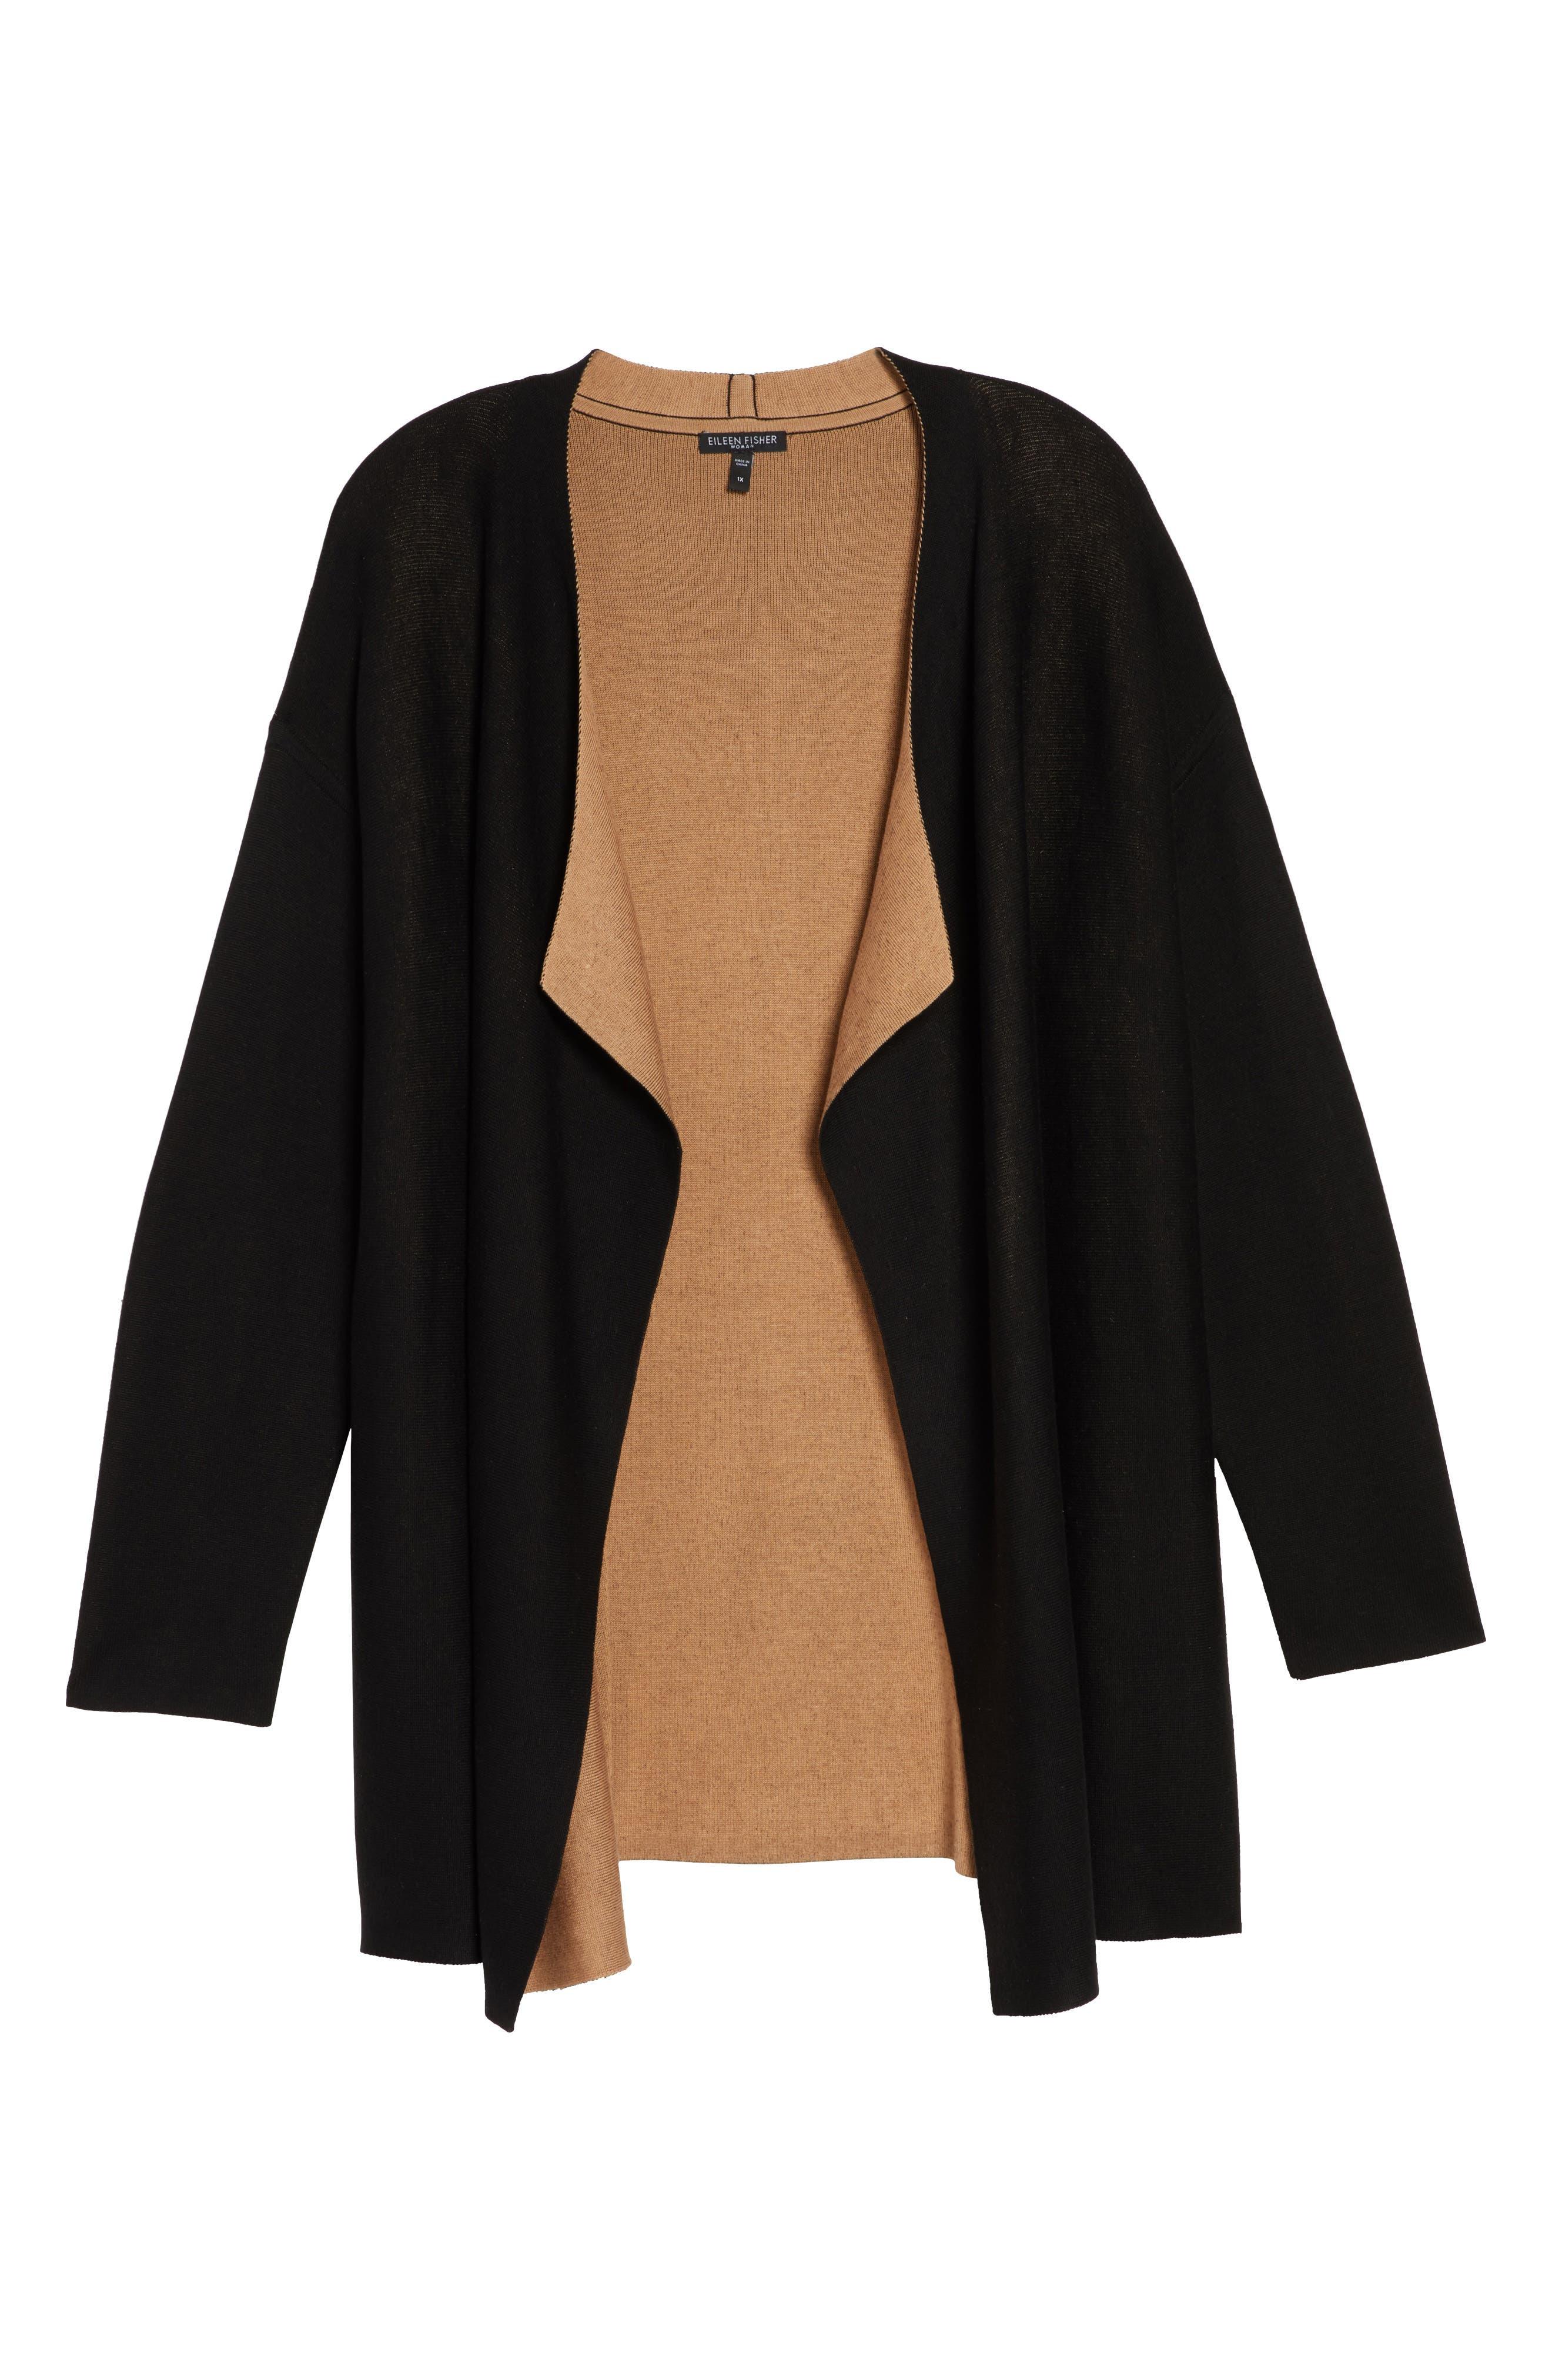 Reversible Silk Blend Cardigan,                             Alternate thumbnail 12, color,                             BLACK/ CLAY